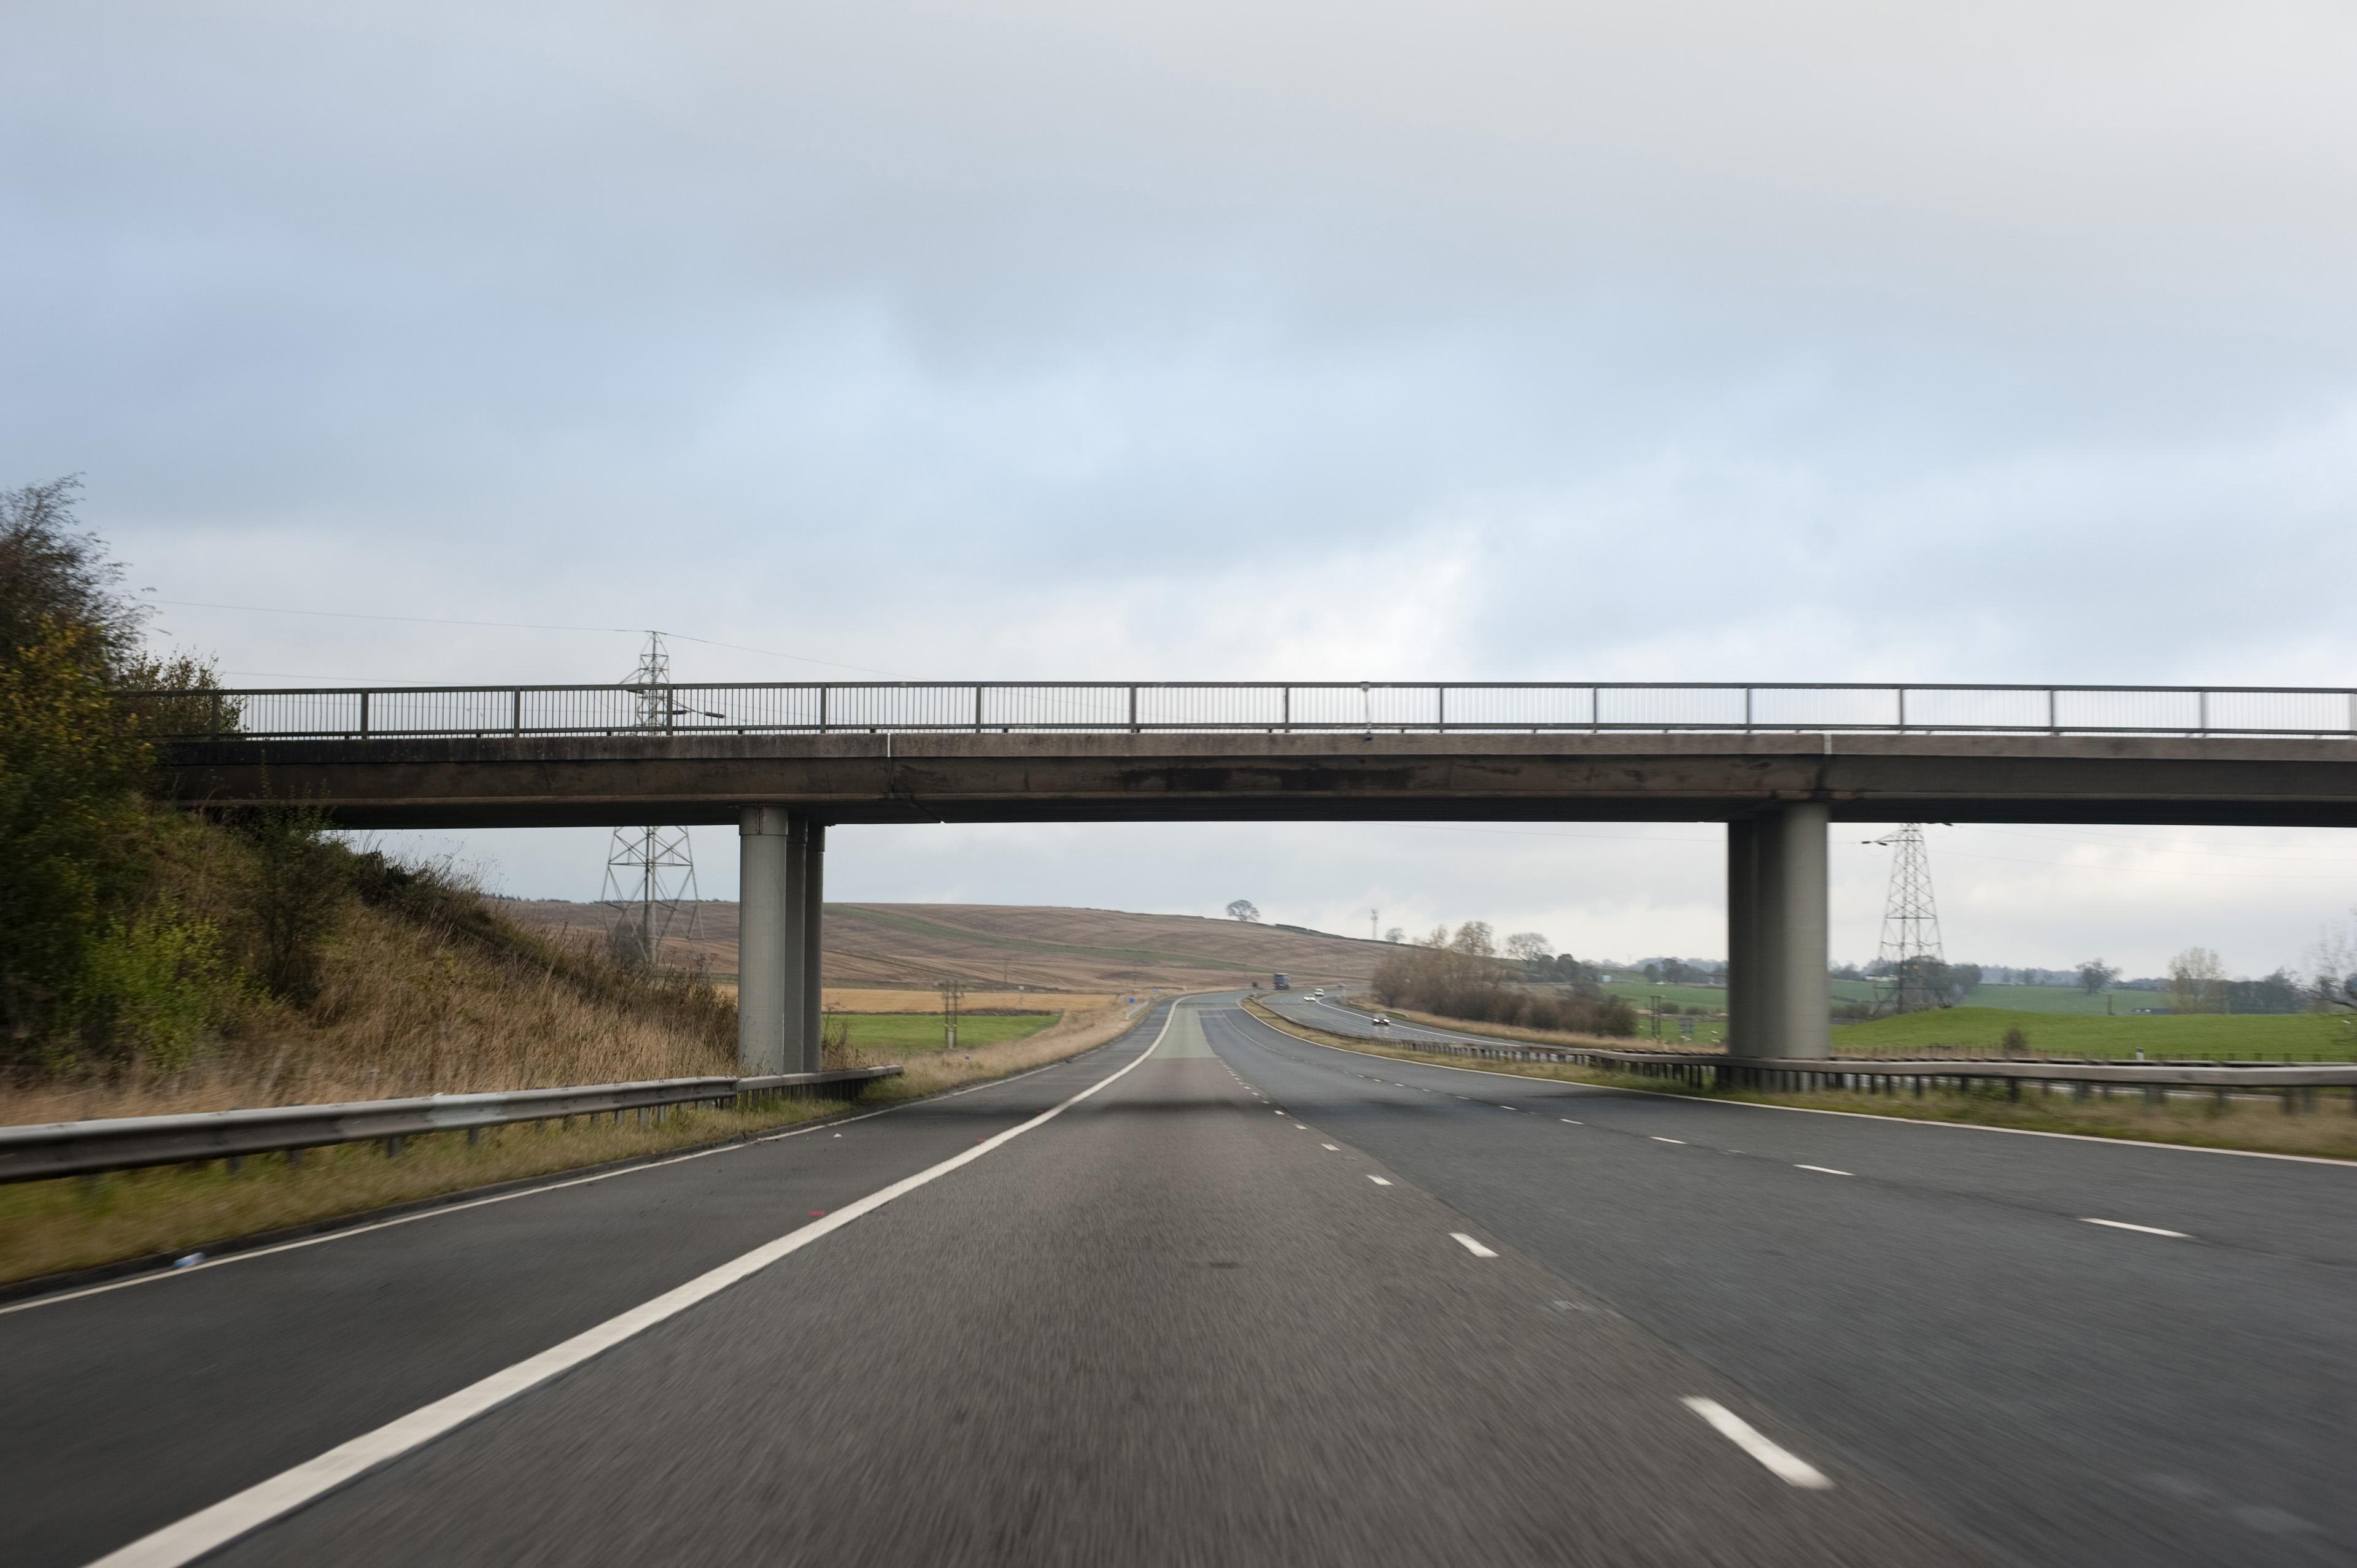 Image of Bridge over a multi lane highway | Freebie.Photography